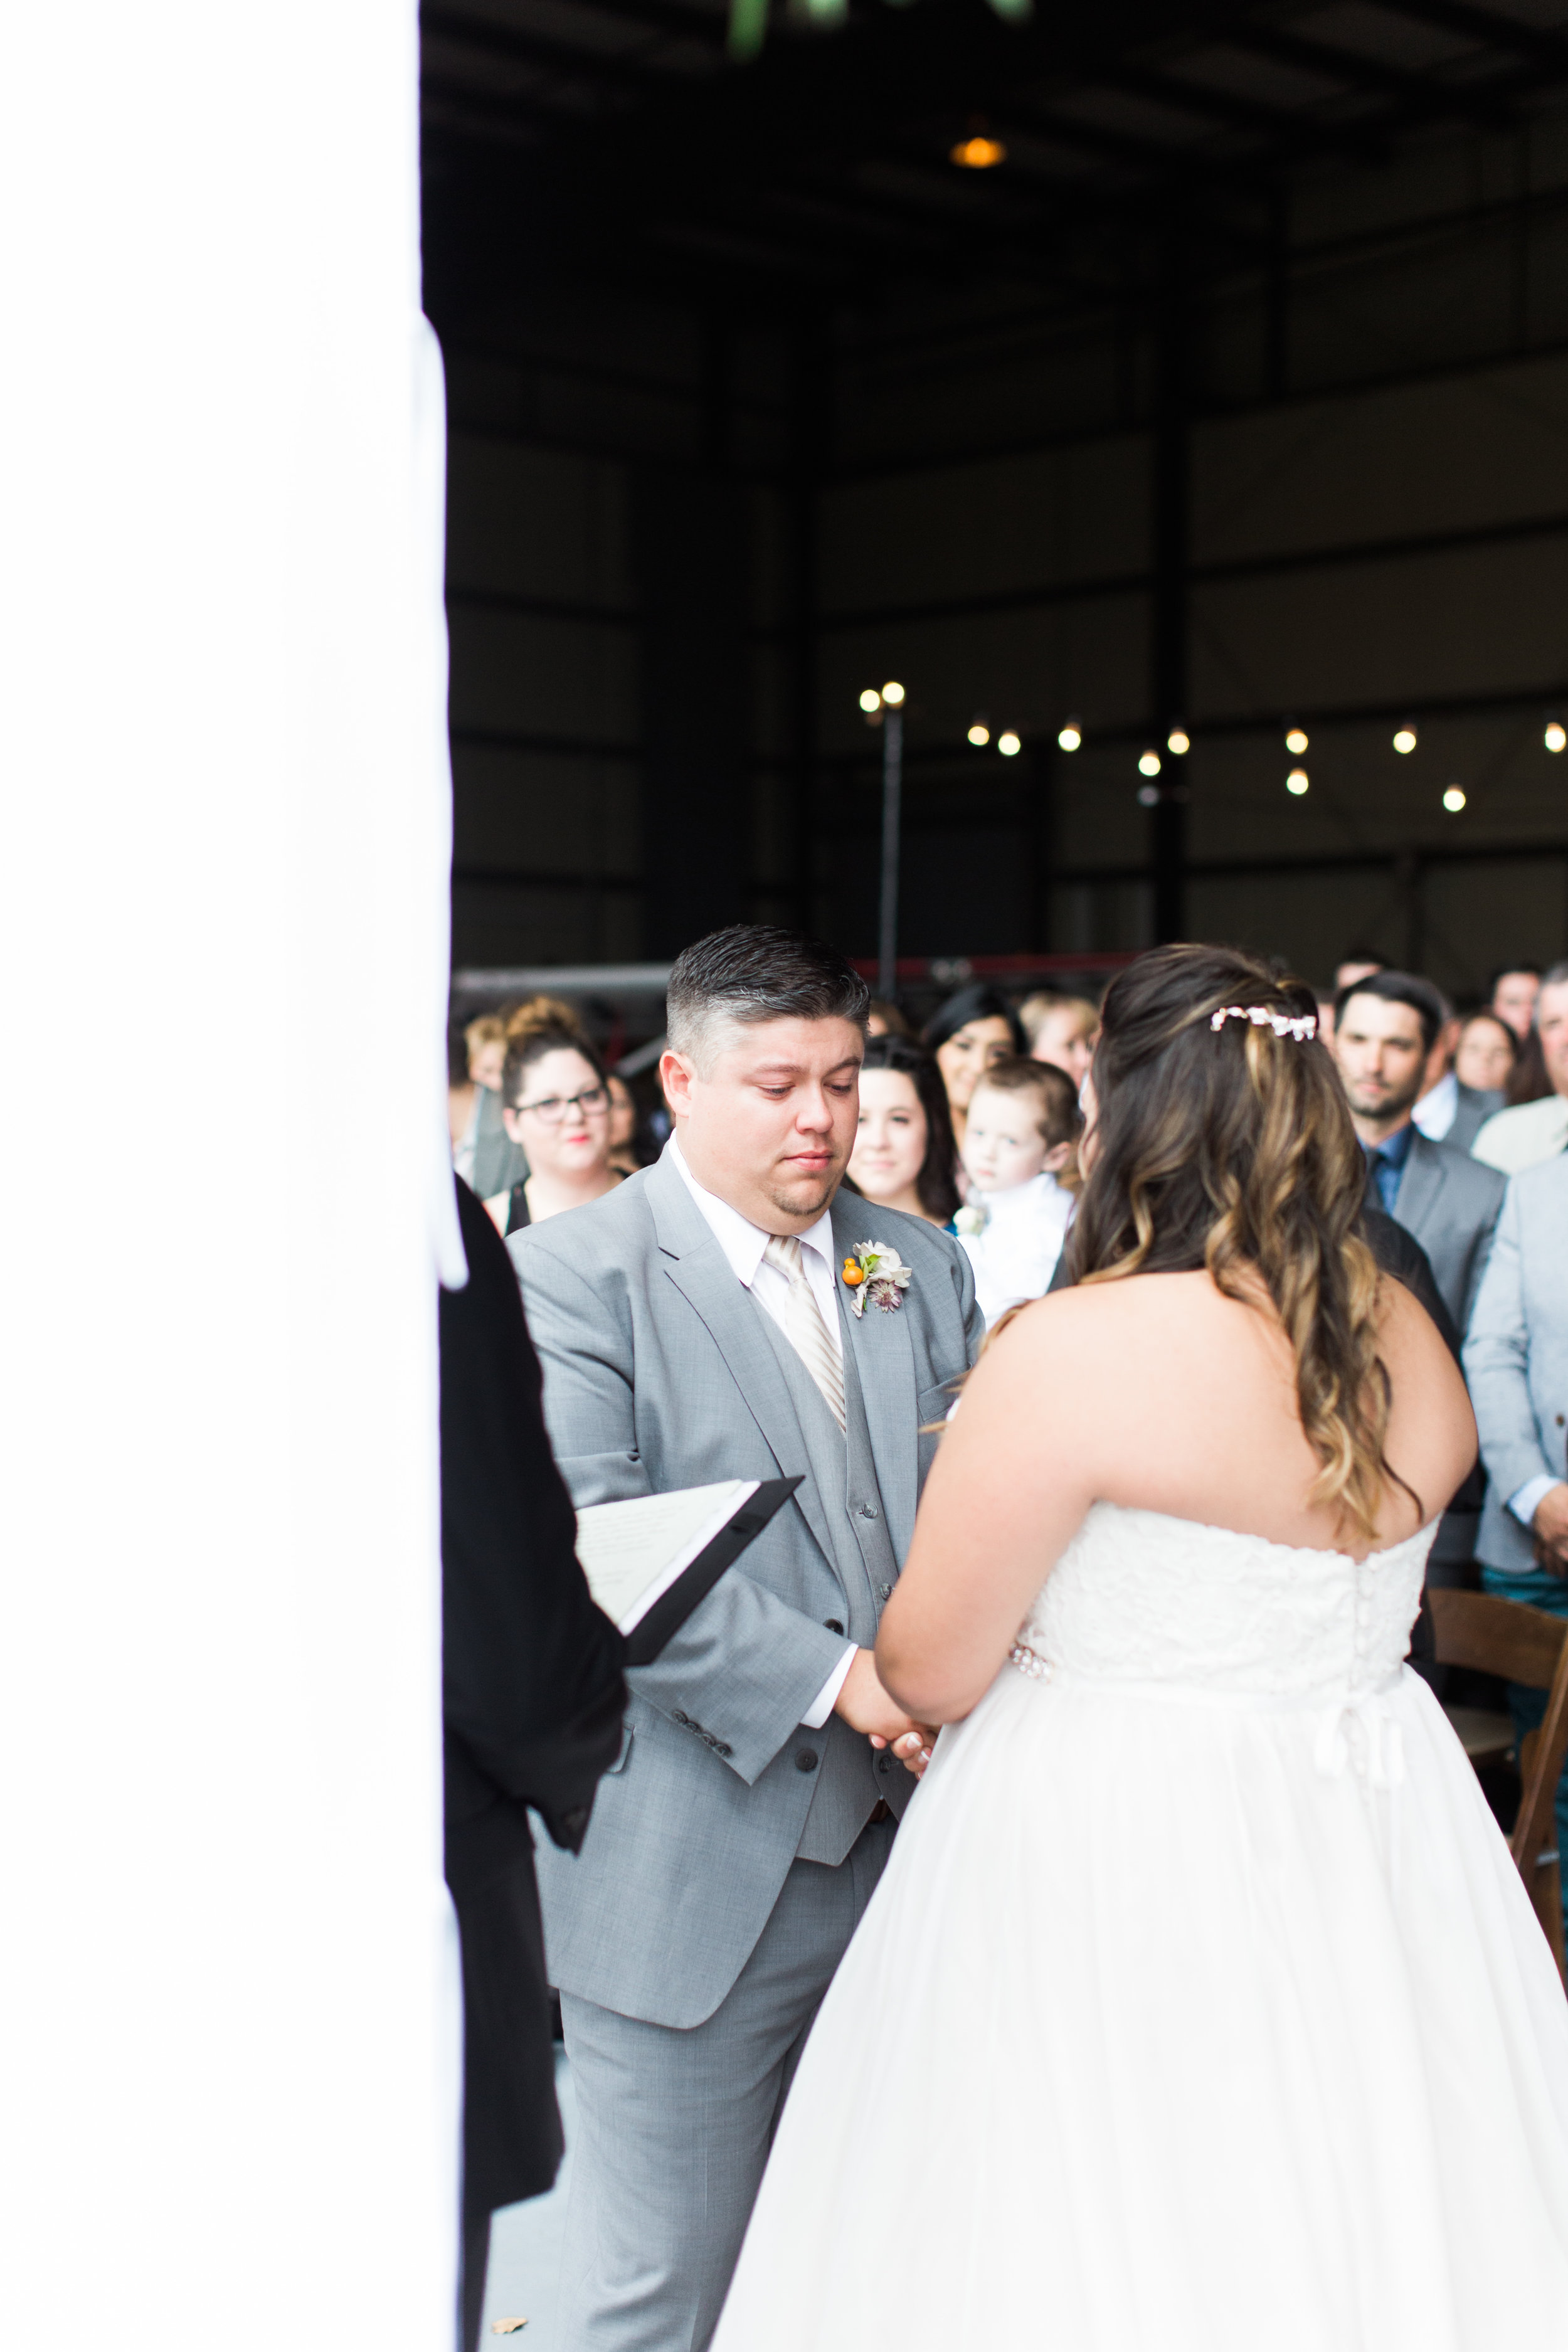 airport-hanger-wedding-at-attitude-aviation-in-livermore-54.jpg